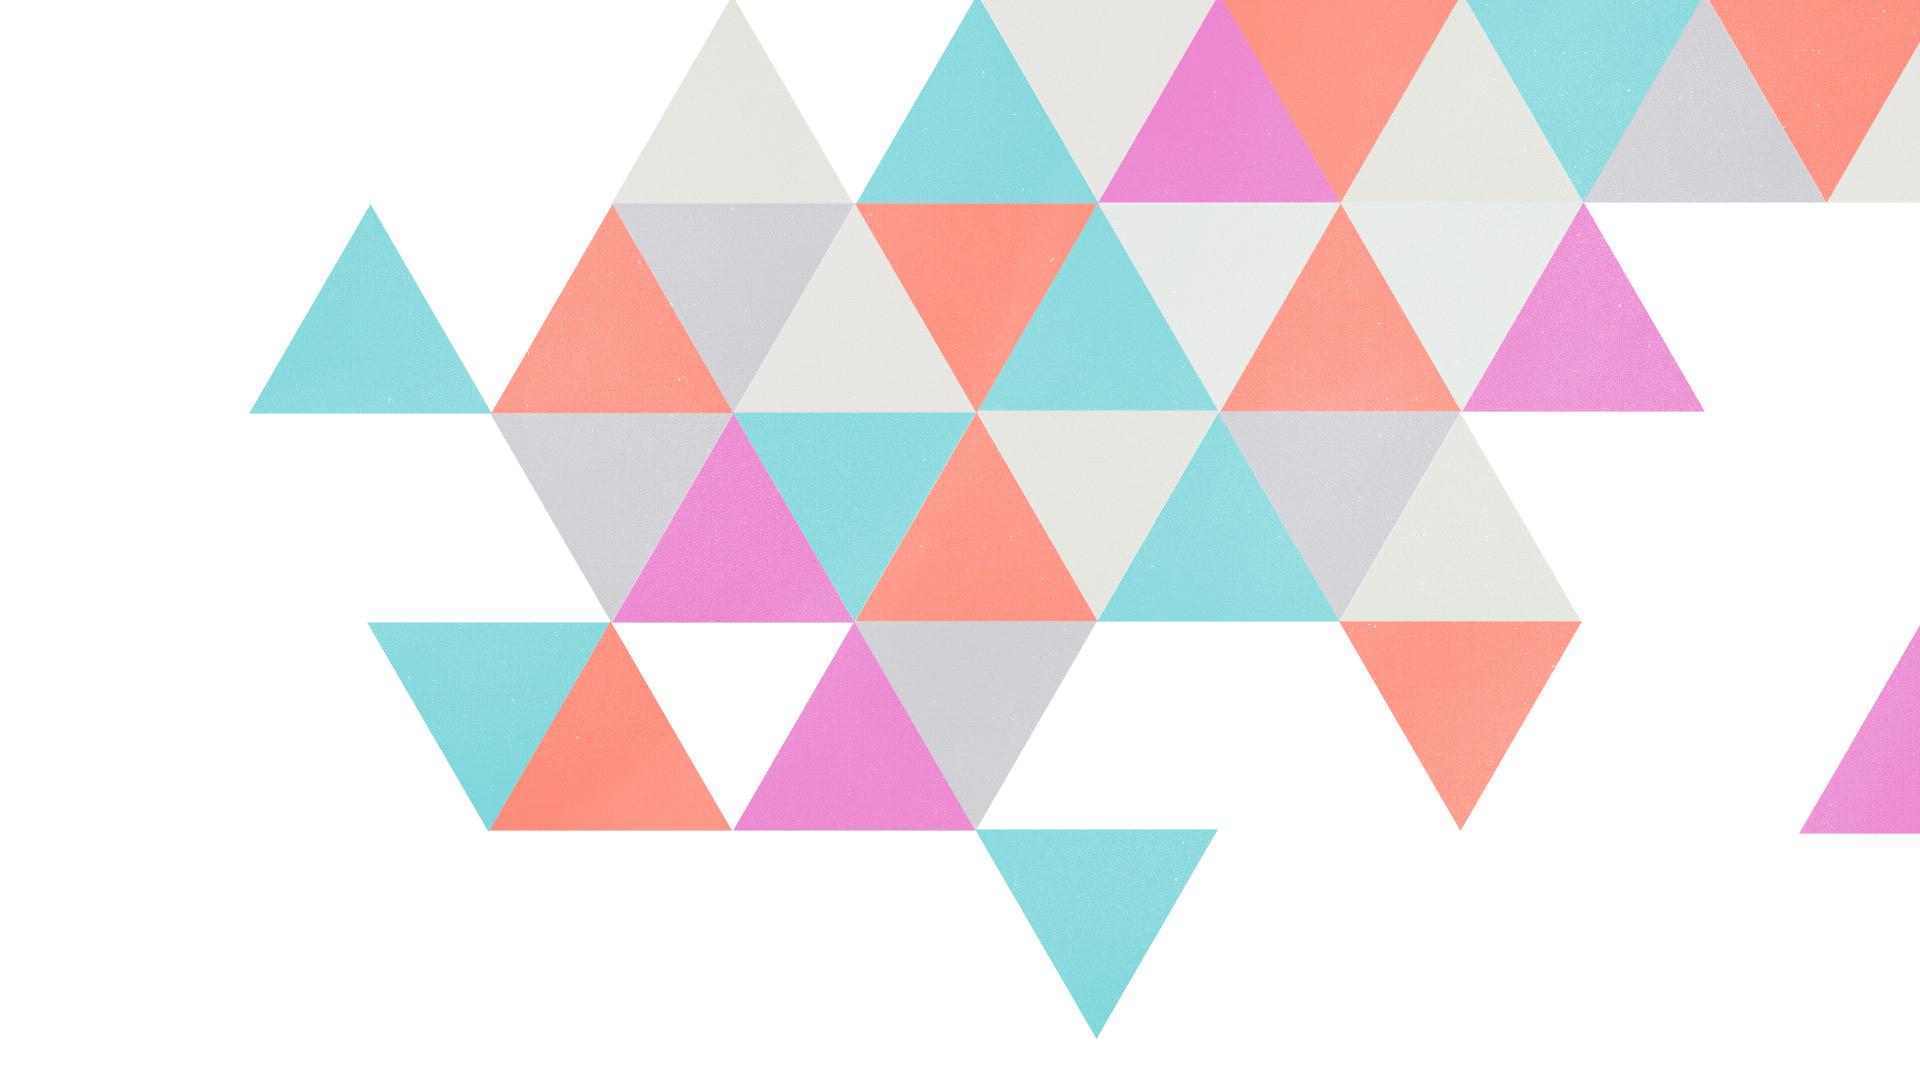 Free Textured Geometric Desktop Wallpaper.